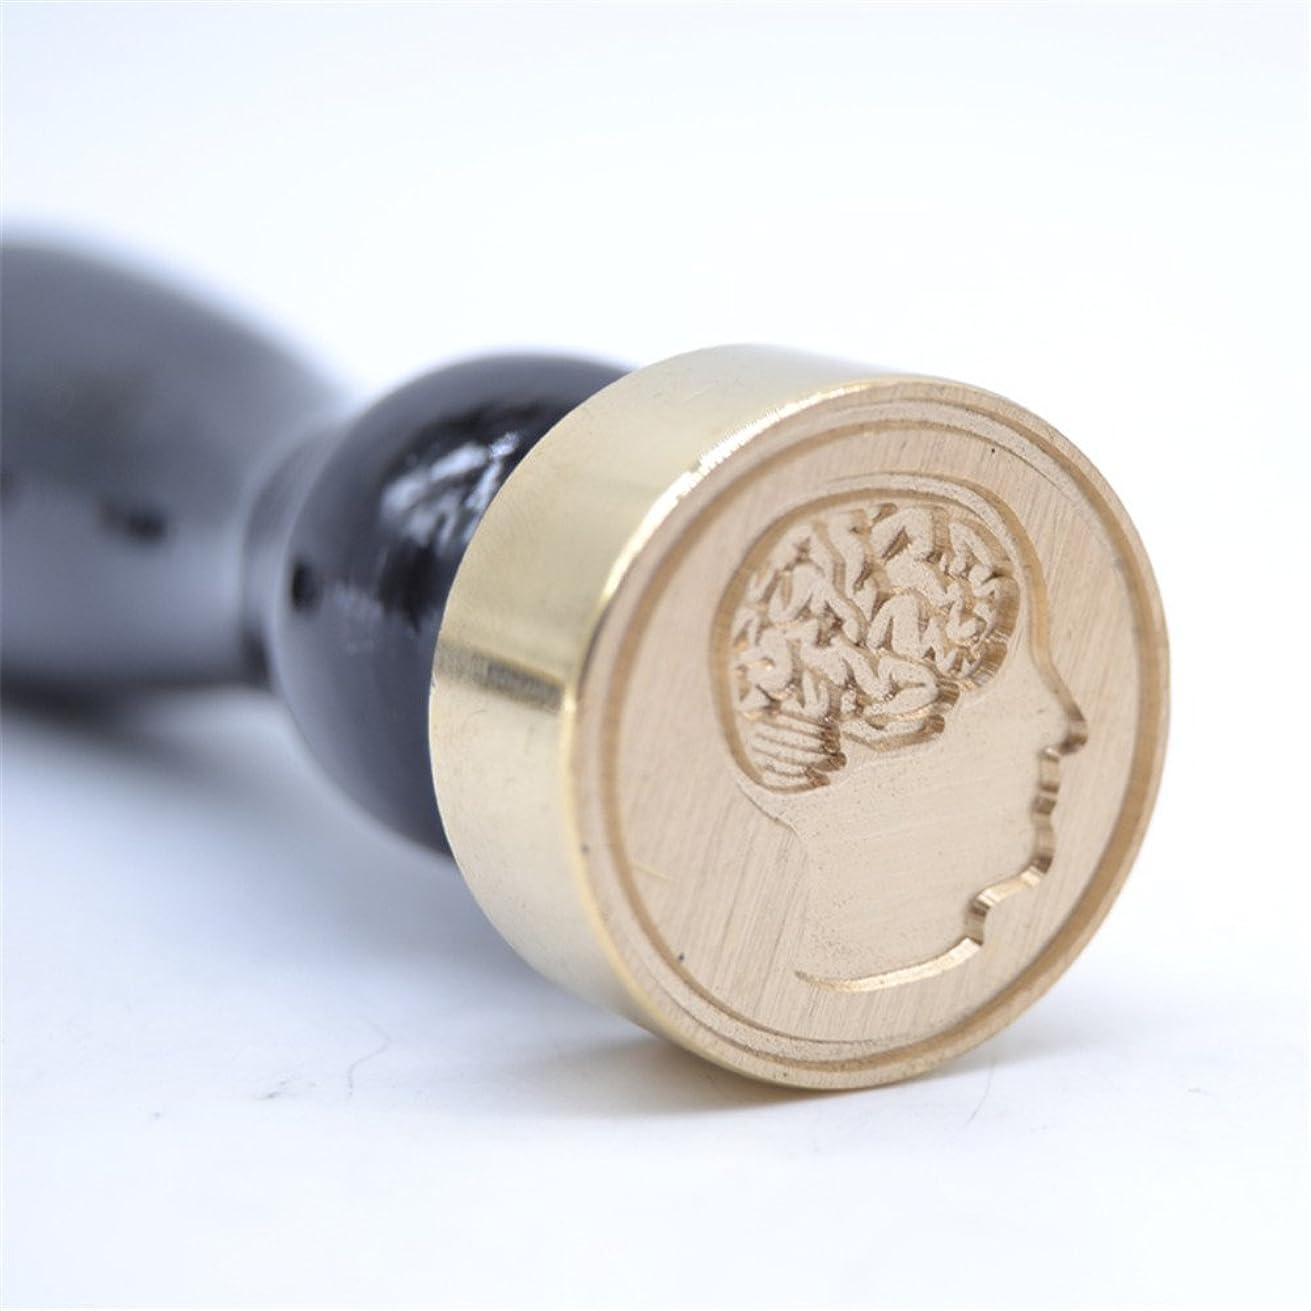 Wax Stamp Anatomical Brain - Halloween Gift